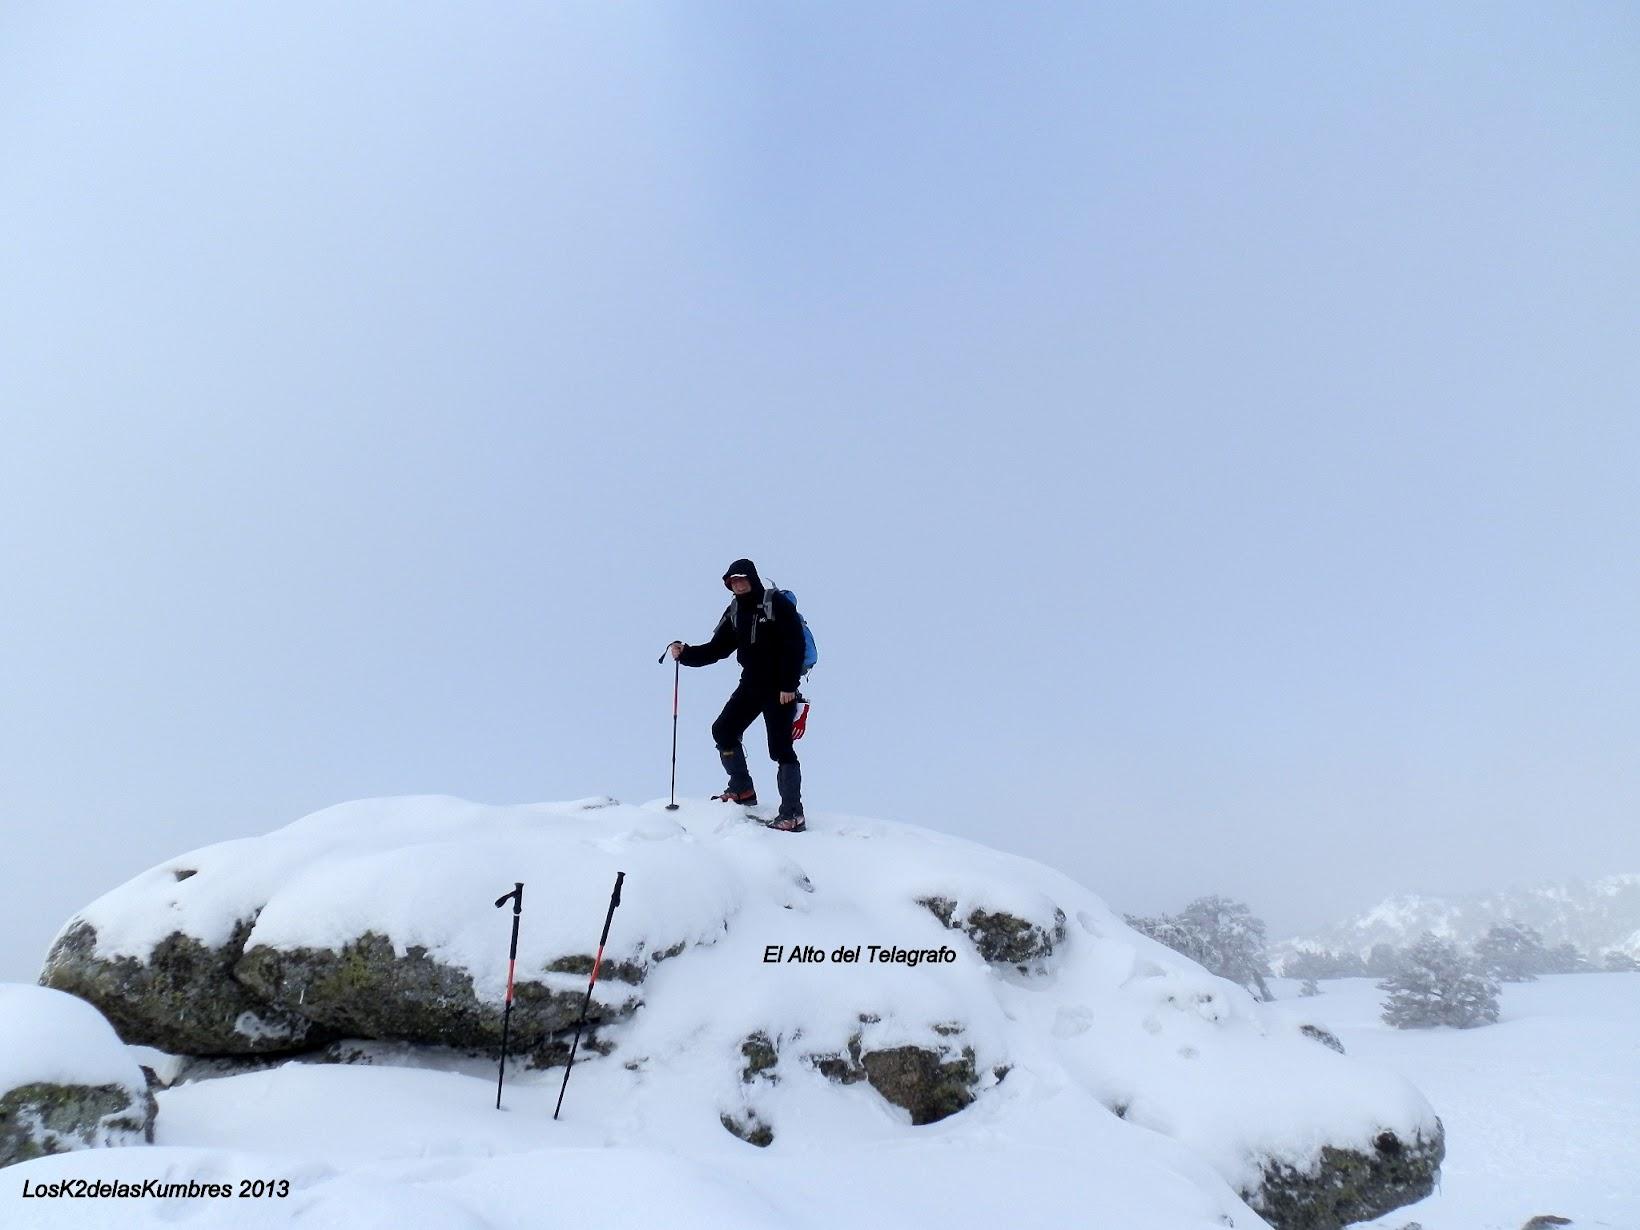 El Alto del Telegrafo, Siete Picos